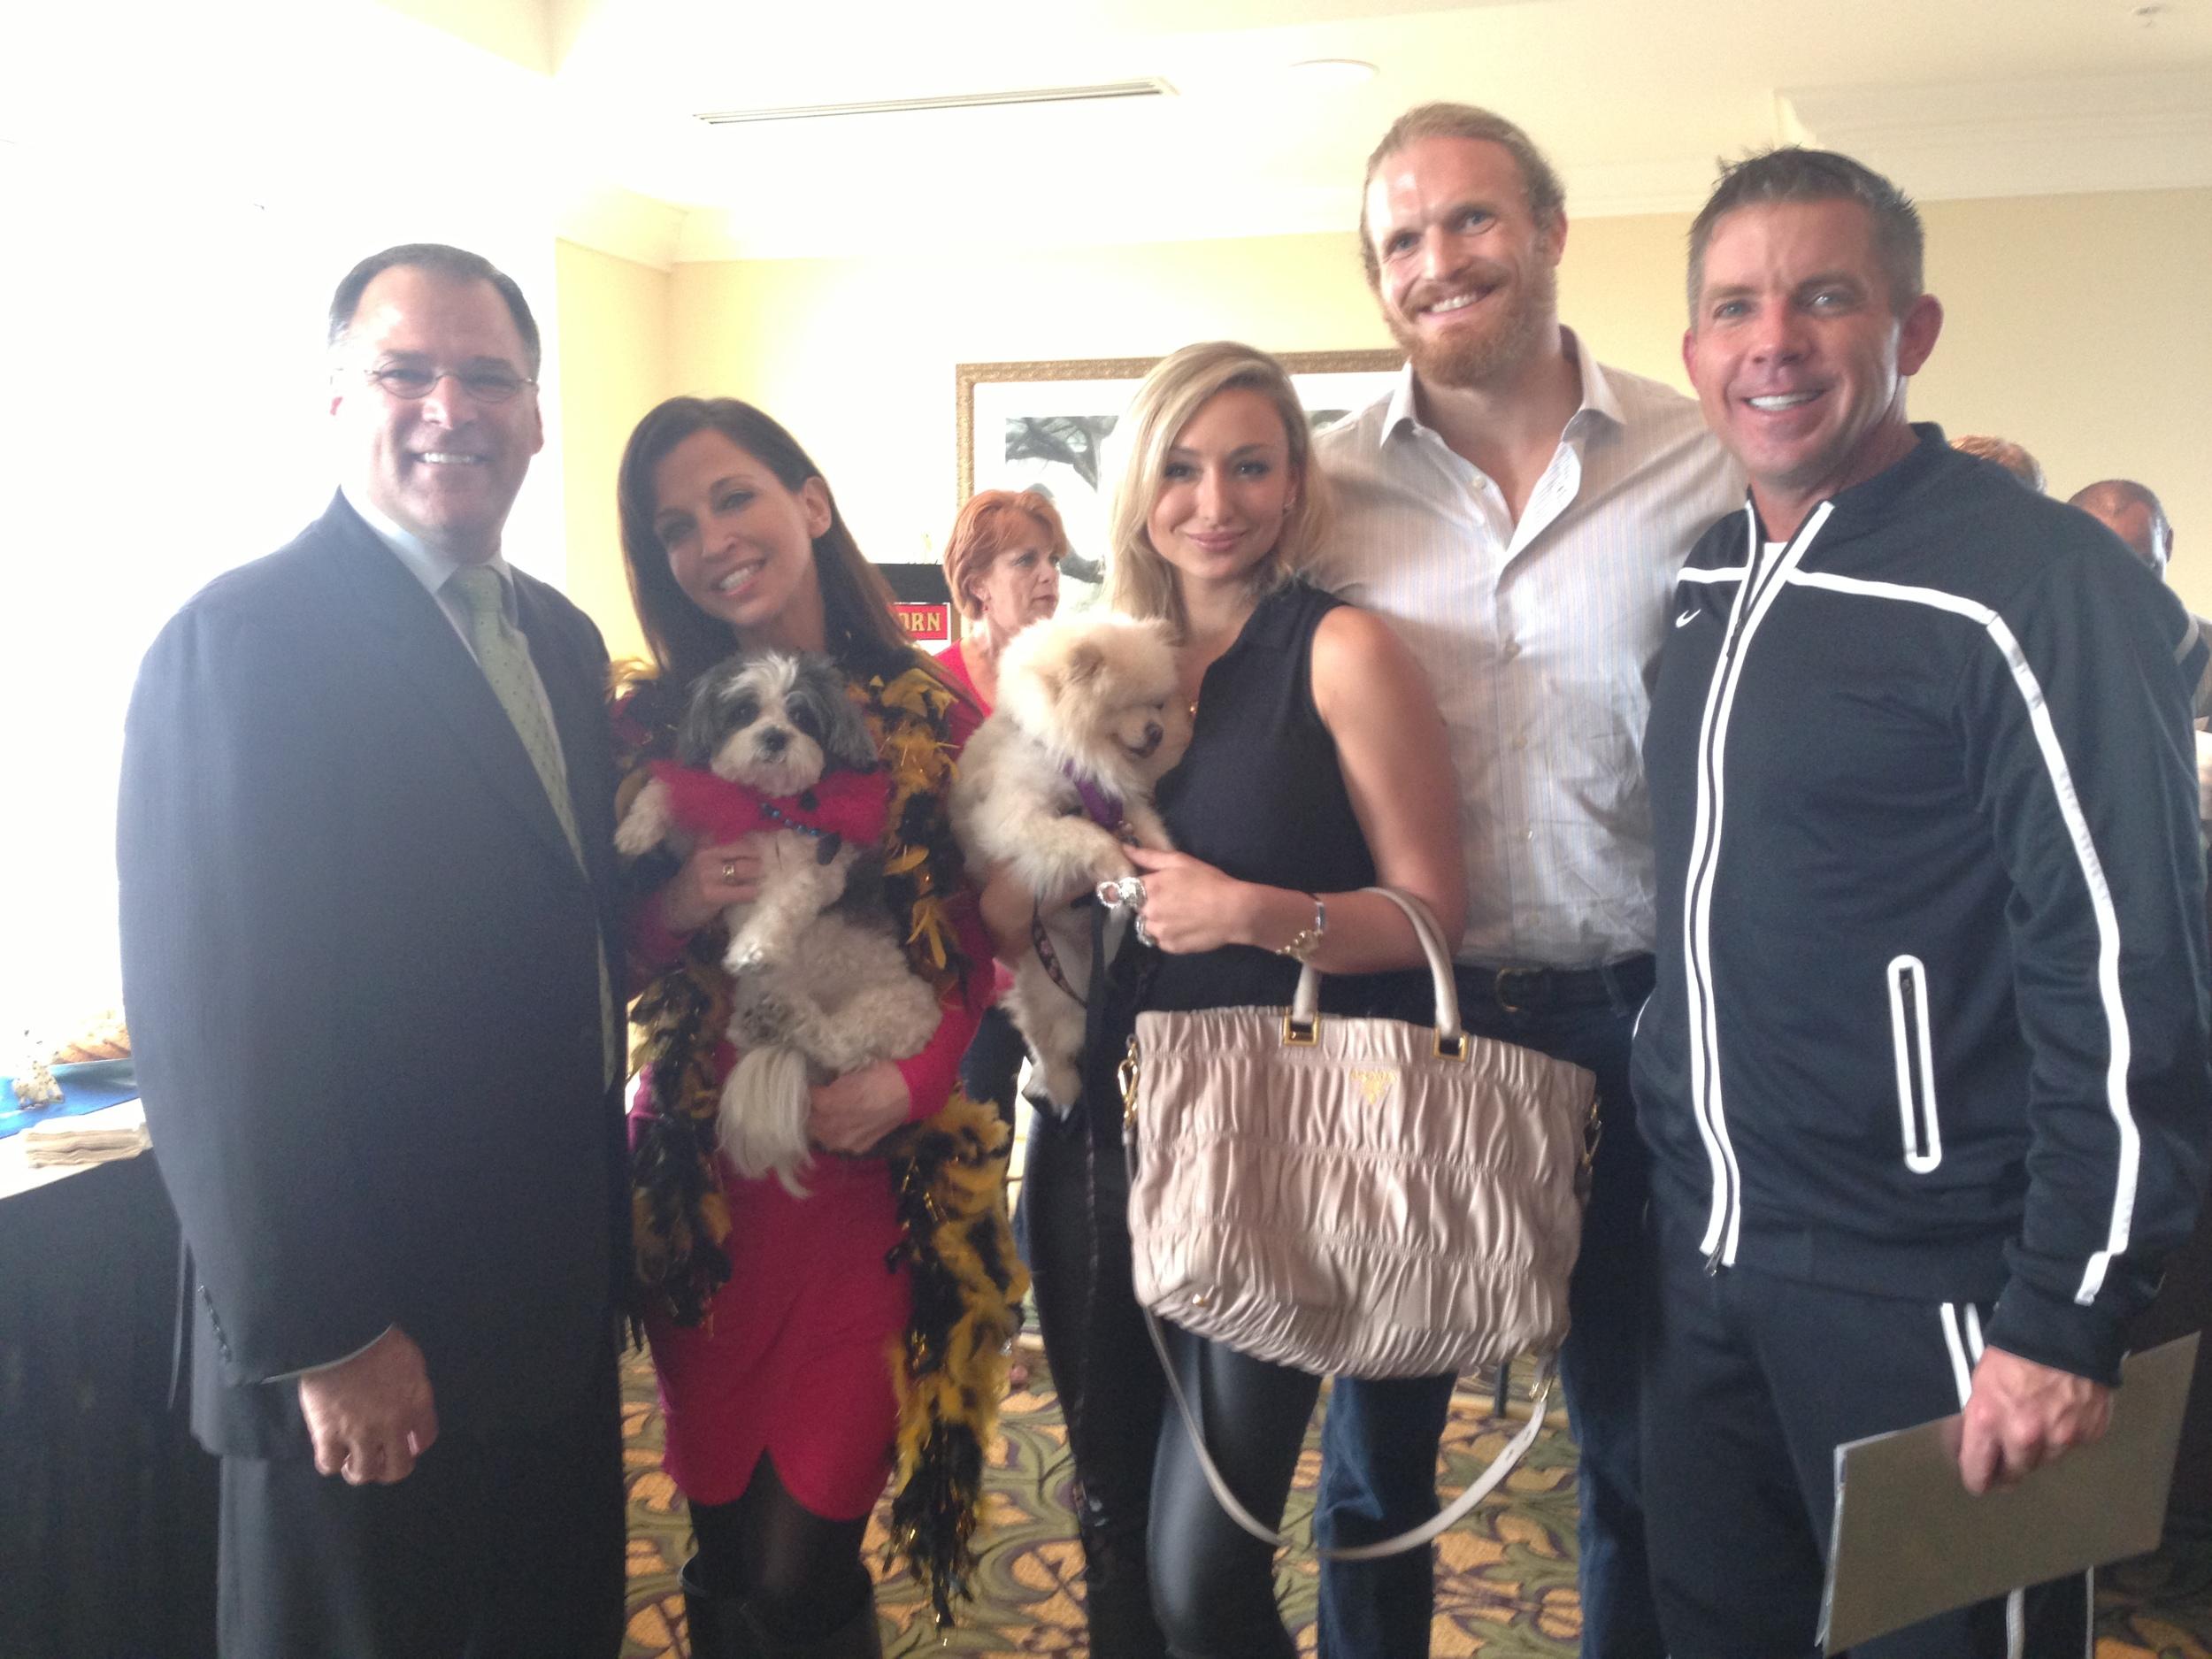 (From Left) Wendy Diamond, myself, Jeff Charleston, Coach Sean Payton of the New Orleans Saints